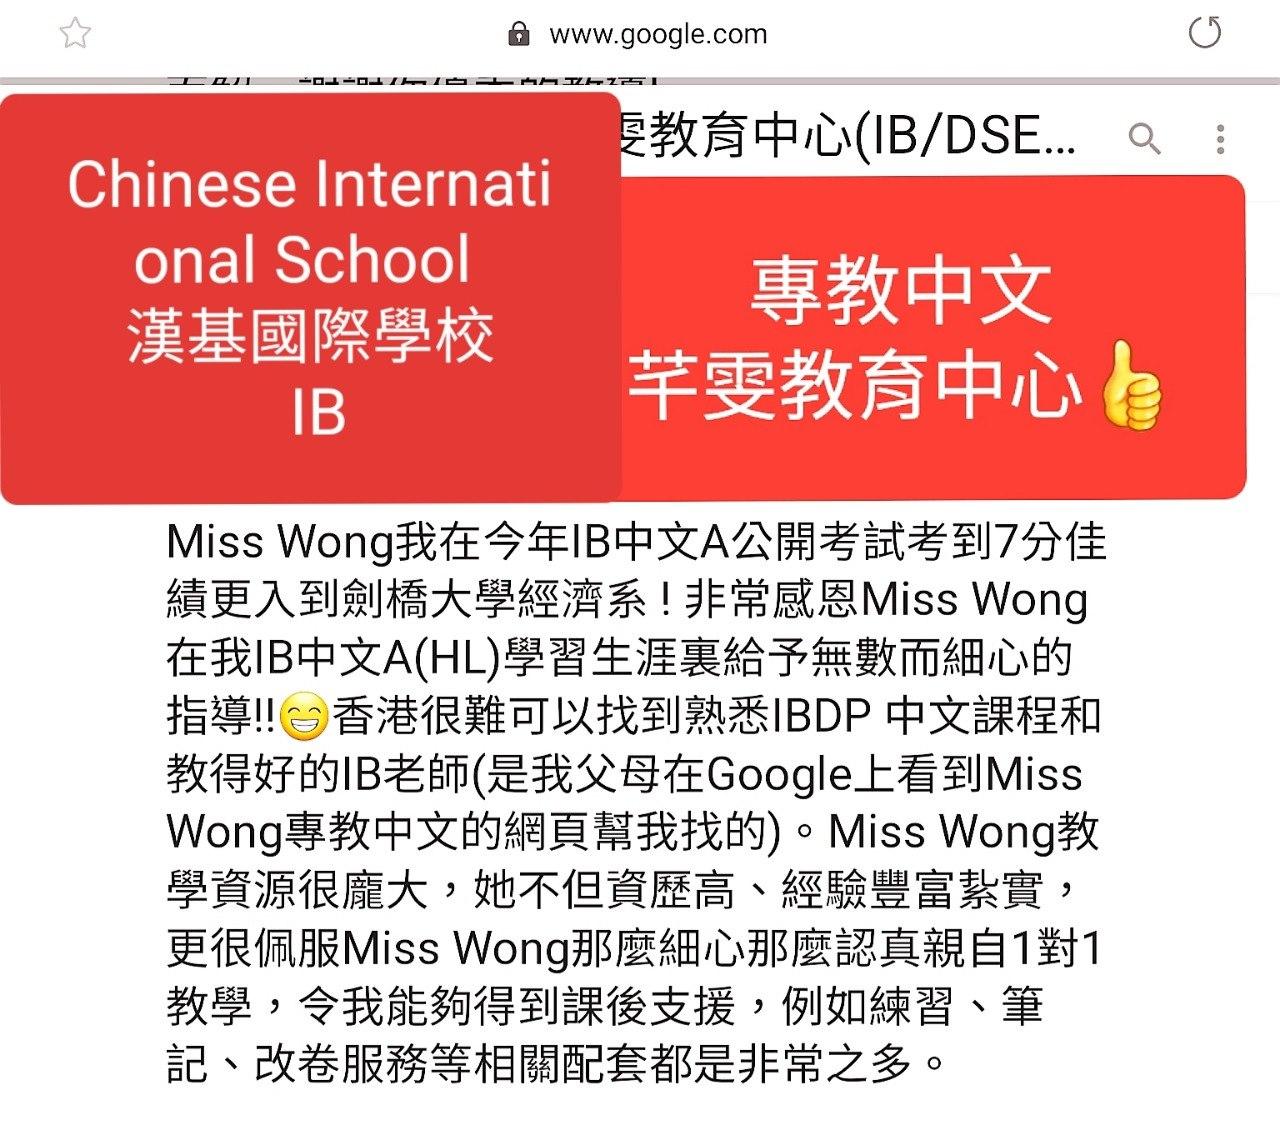 A www.google.com 要教育中心(IB/DSE a Chinese Internati onal School 專教中文 芊要教育中心自 漢基國際學校 IB Miss Wong我在今年1B中文A公開考試考到7分佳 績更入到劍橋大學經濟系!非常感恩Miss Wong 在我IB中文A(HL)學習生涯裏給予無數而細心的 指導!!香港很難可以找到熟悉IBDP 中文課程和 教得好的IB老師(是我父母在Google上看到Miss Wong專教中文的網頁幫我找的)。Miss Wong教 學資源很魔大,她不但資歷高、經驗豐富紮實, 更很佩服Miss Wong那麼細心那麼認真親自1對1 教學,令我能夠得到課後支援,例如練習、筆 記、改卷服務等相關配套都是非常之多。  Text,Font,Line